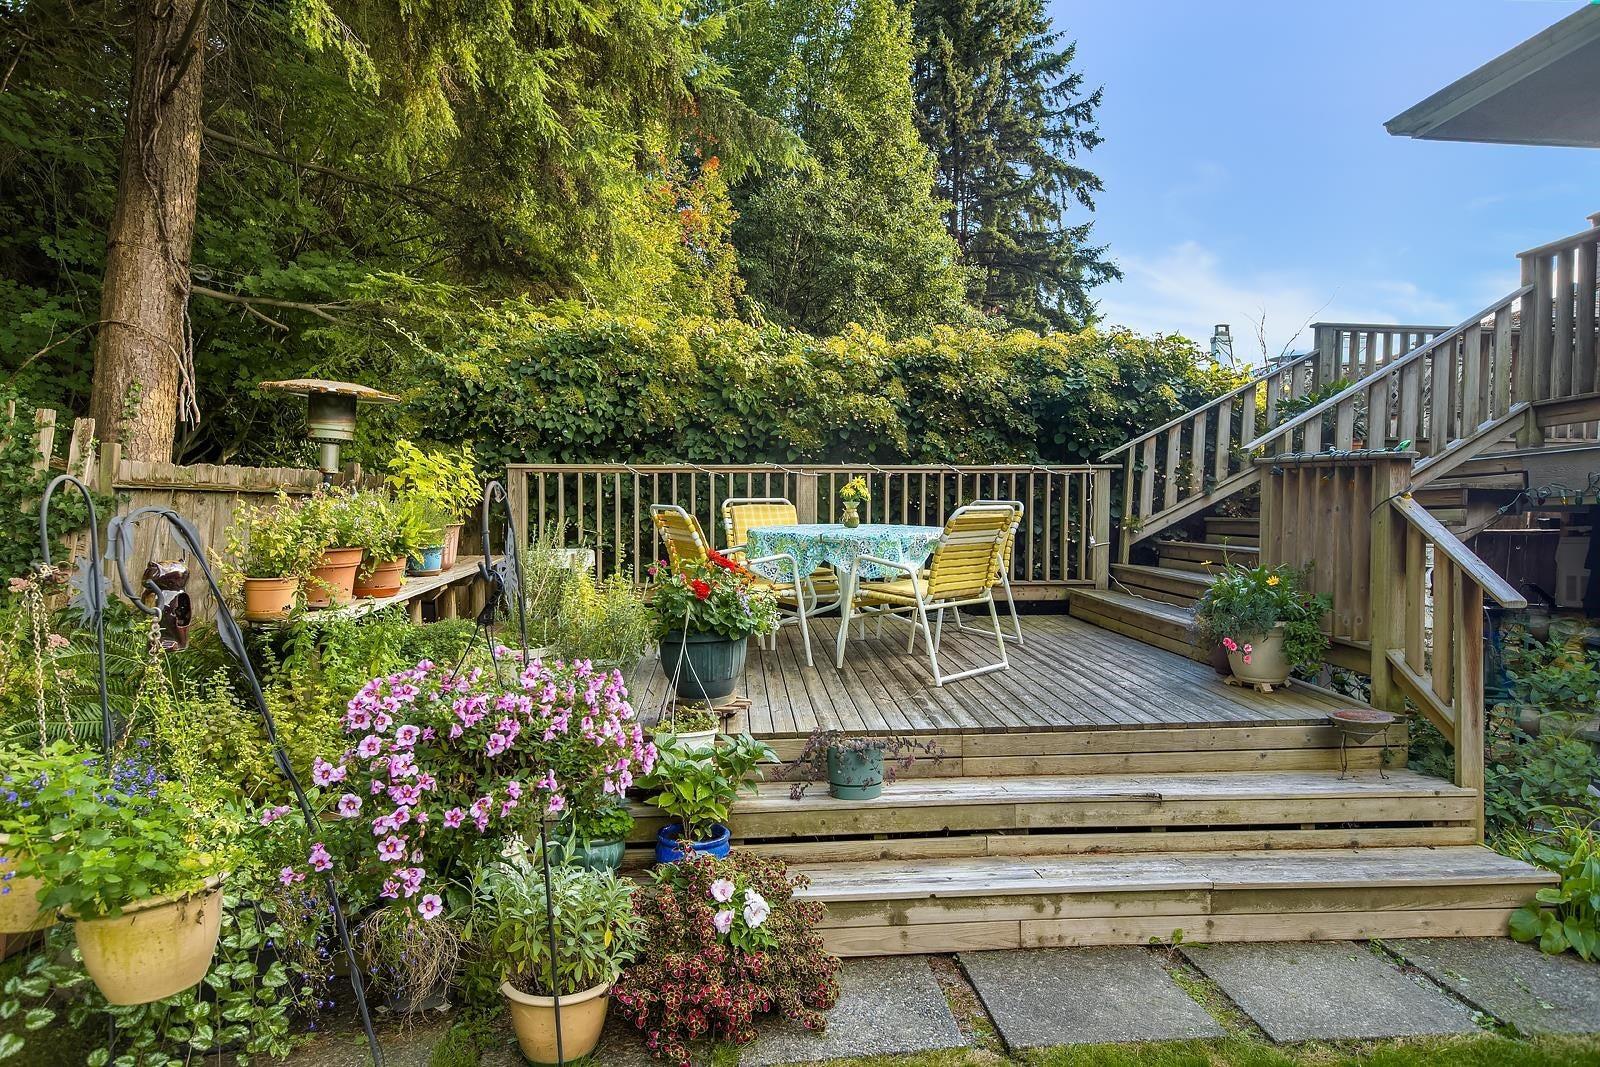 3495 WELLINGTON CRESCENT - Edgemont House/Single Family for sale, 3 Bedrooms (R2617949) - #7